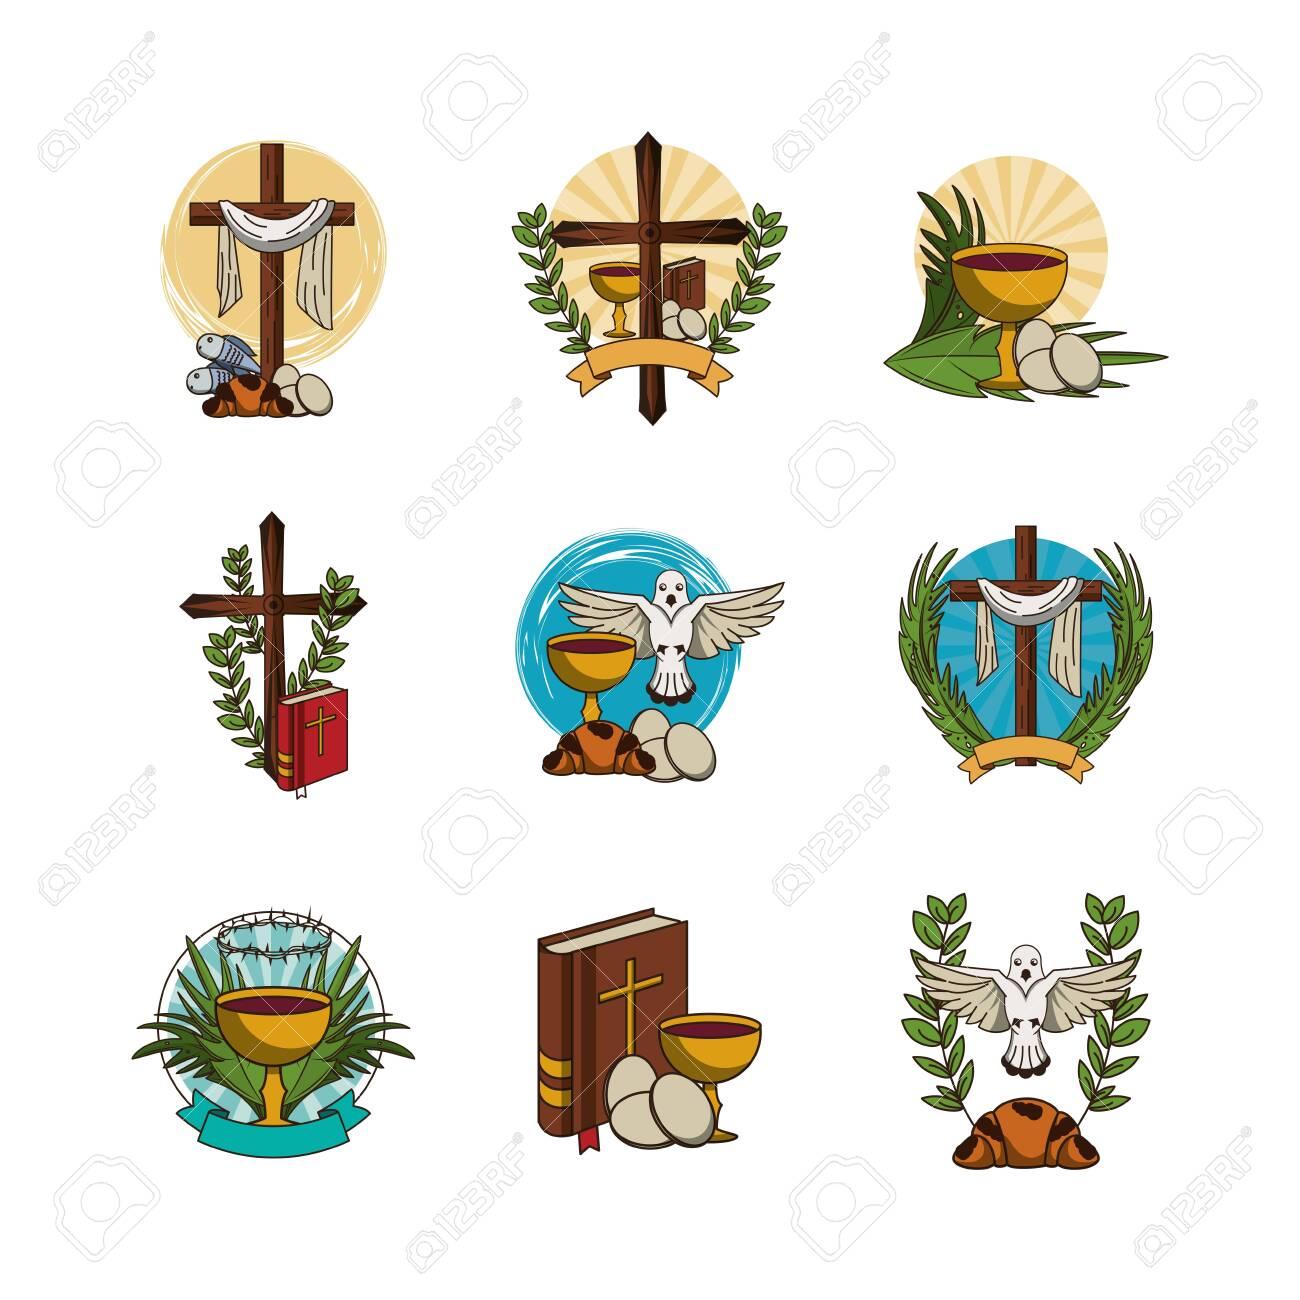 bundle of first communion set icons vector illustration design - 136883404